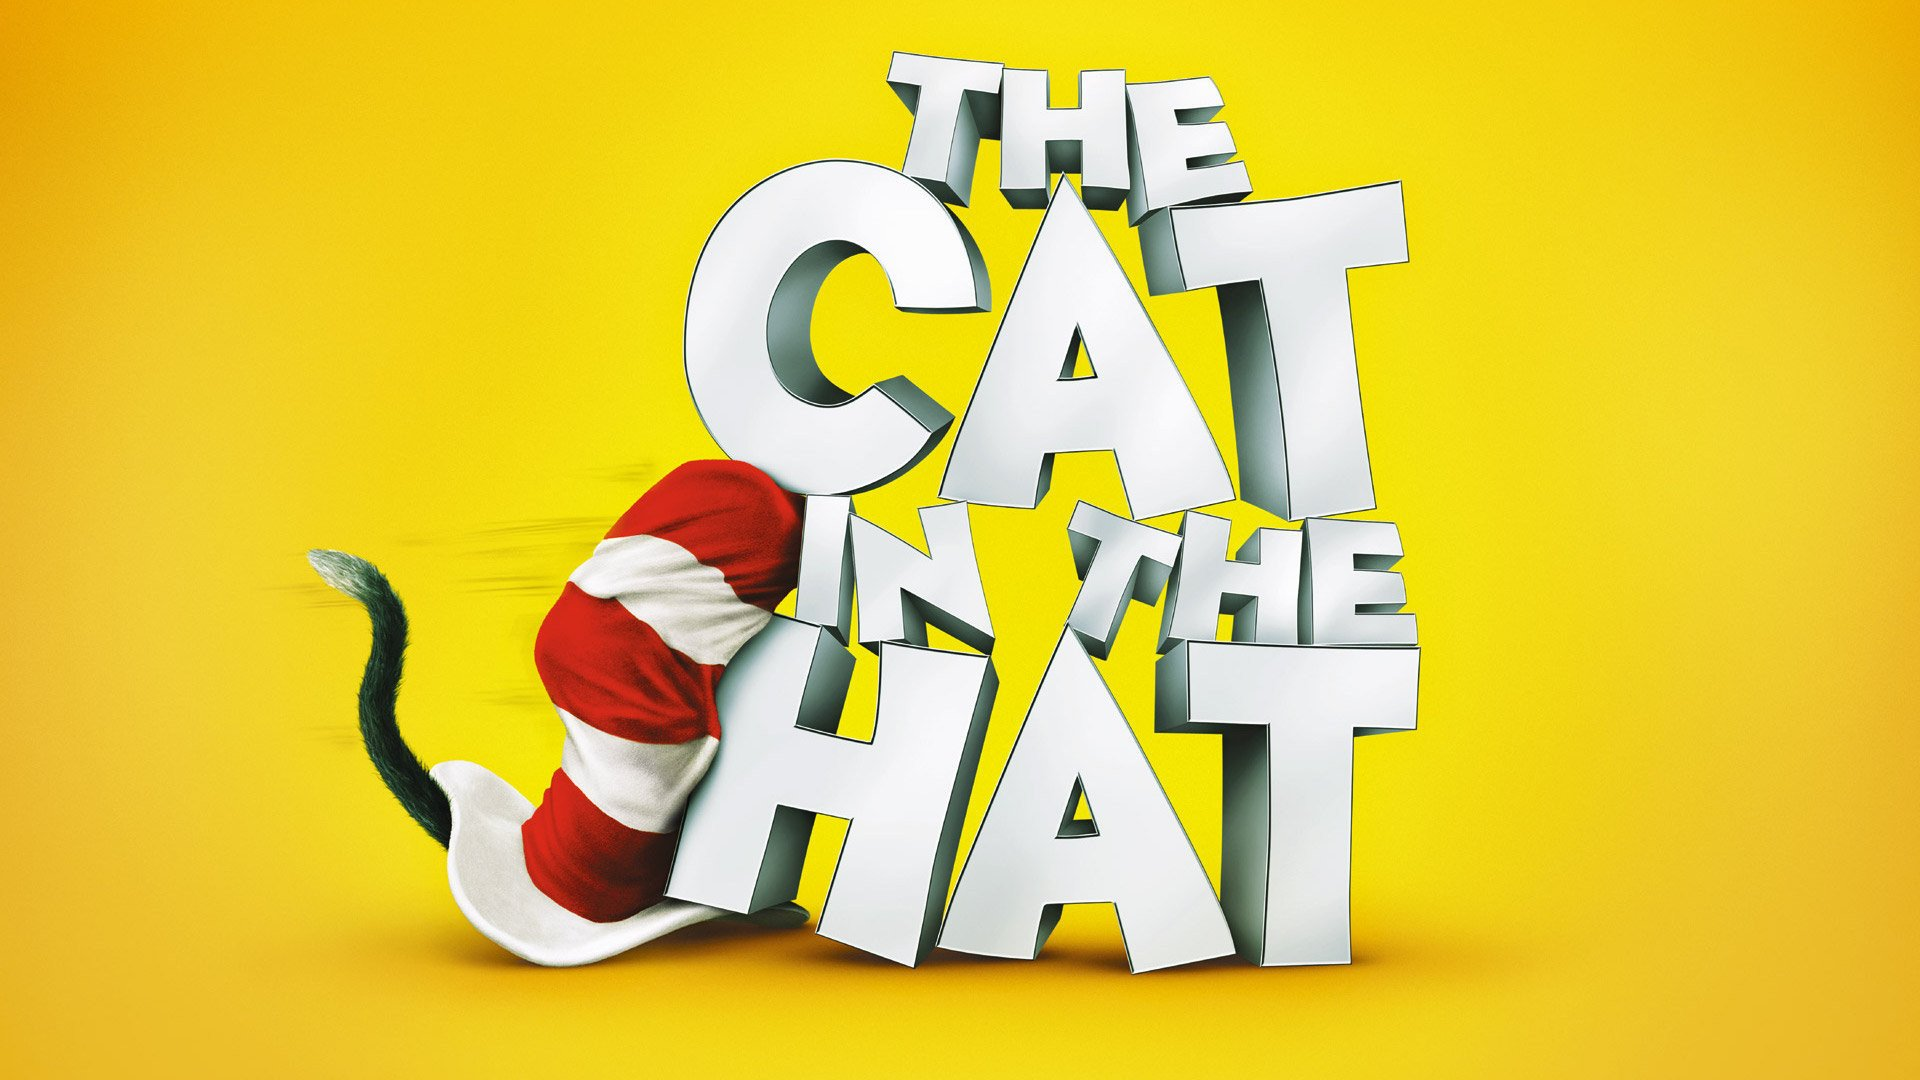 The Cat in the Hat Wallpapers HD Desktop Wallpapers 1920x1080